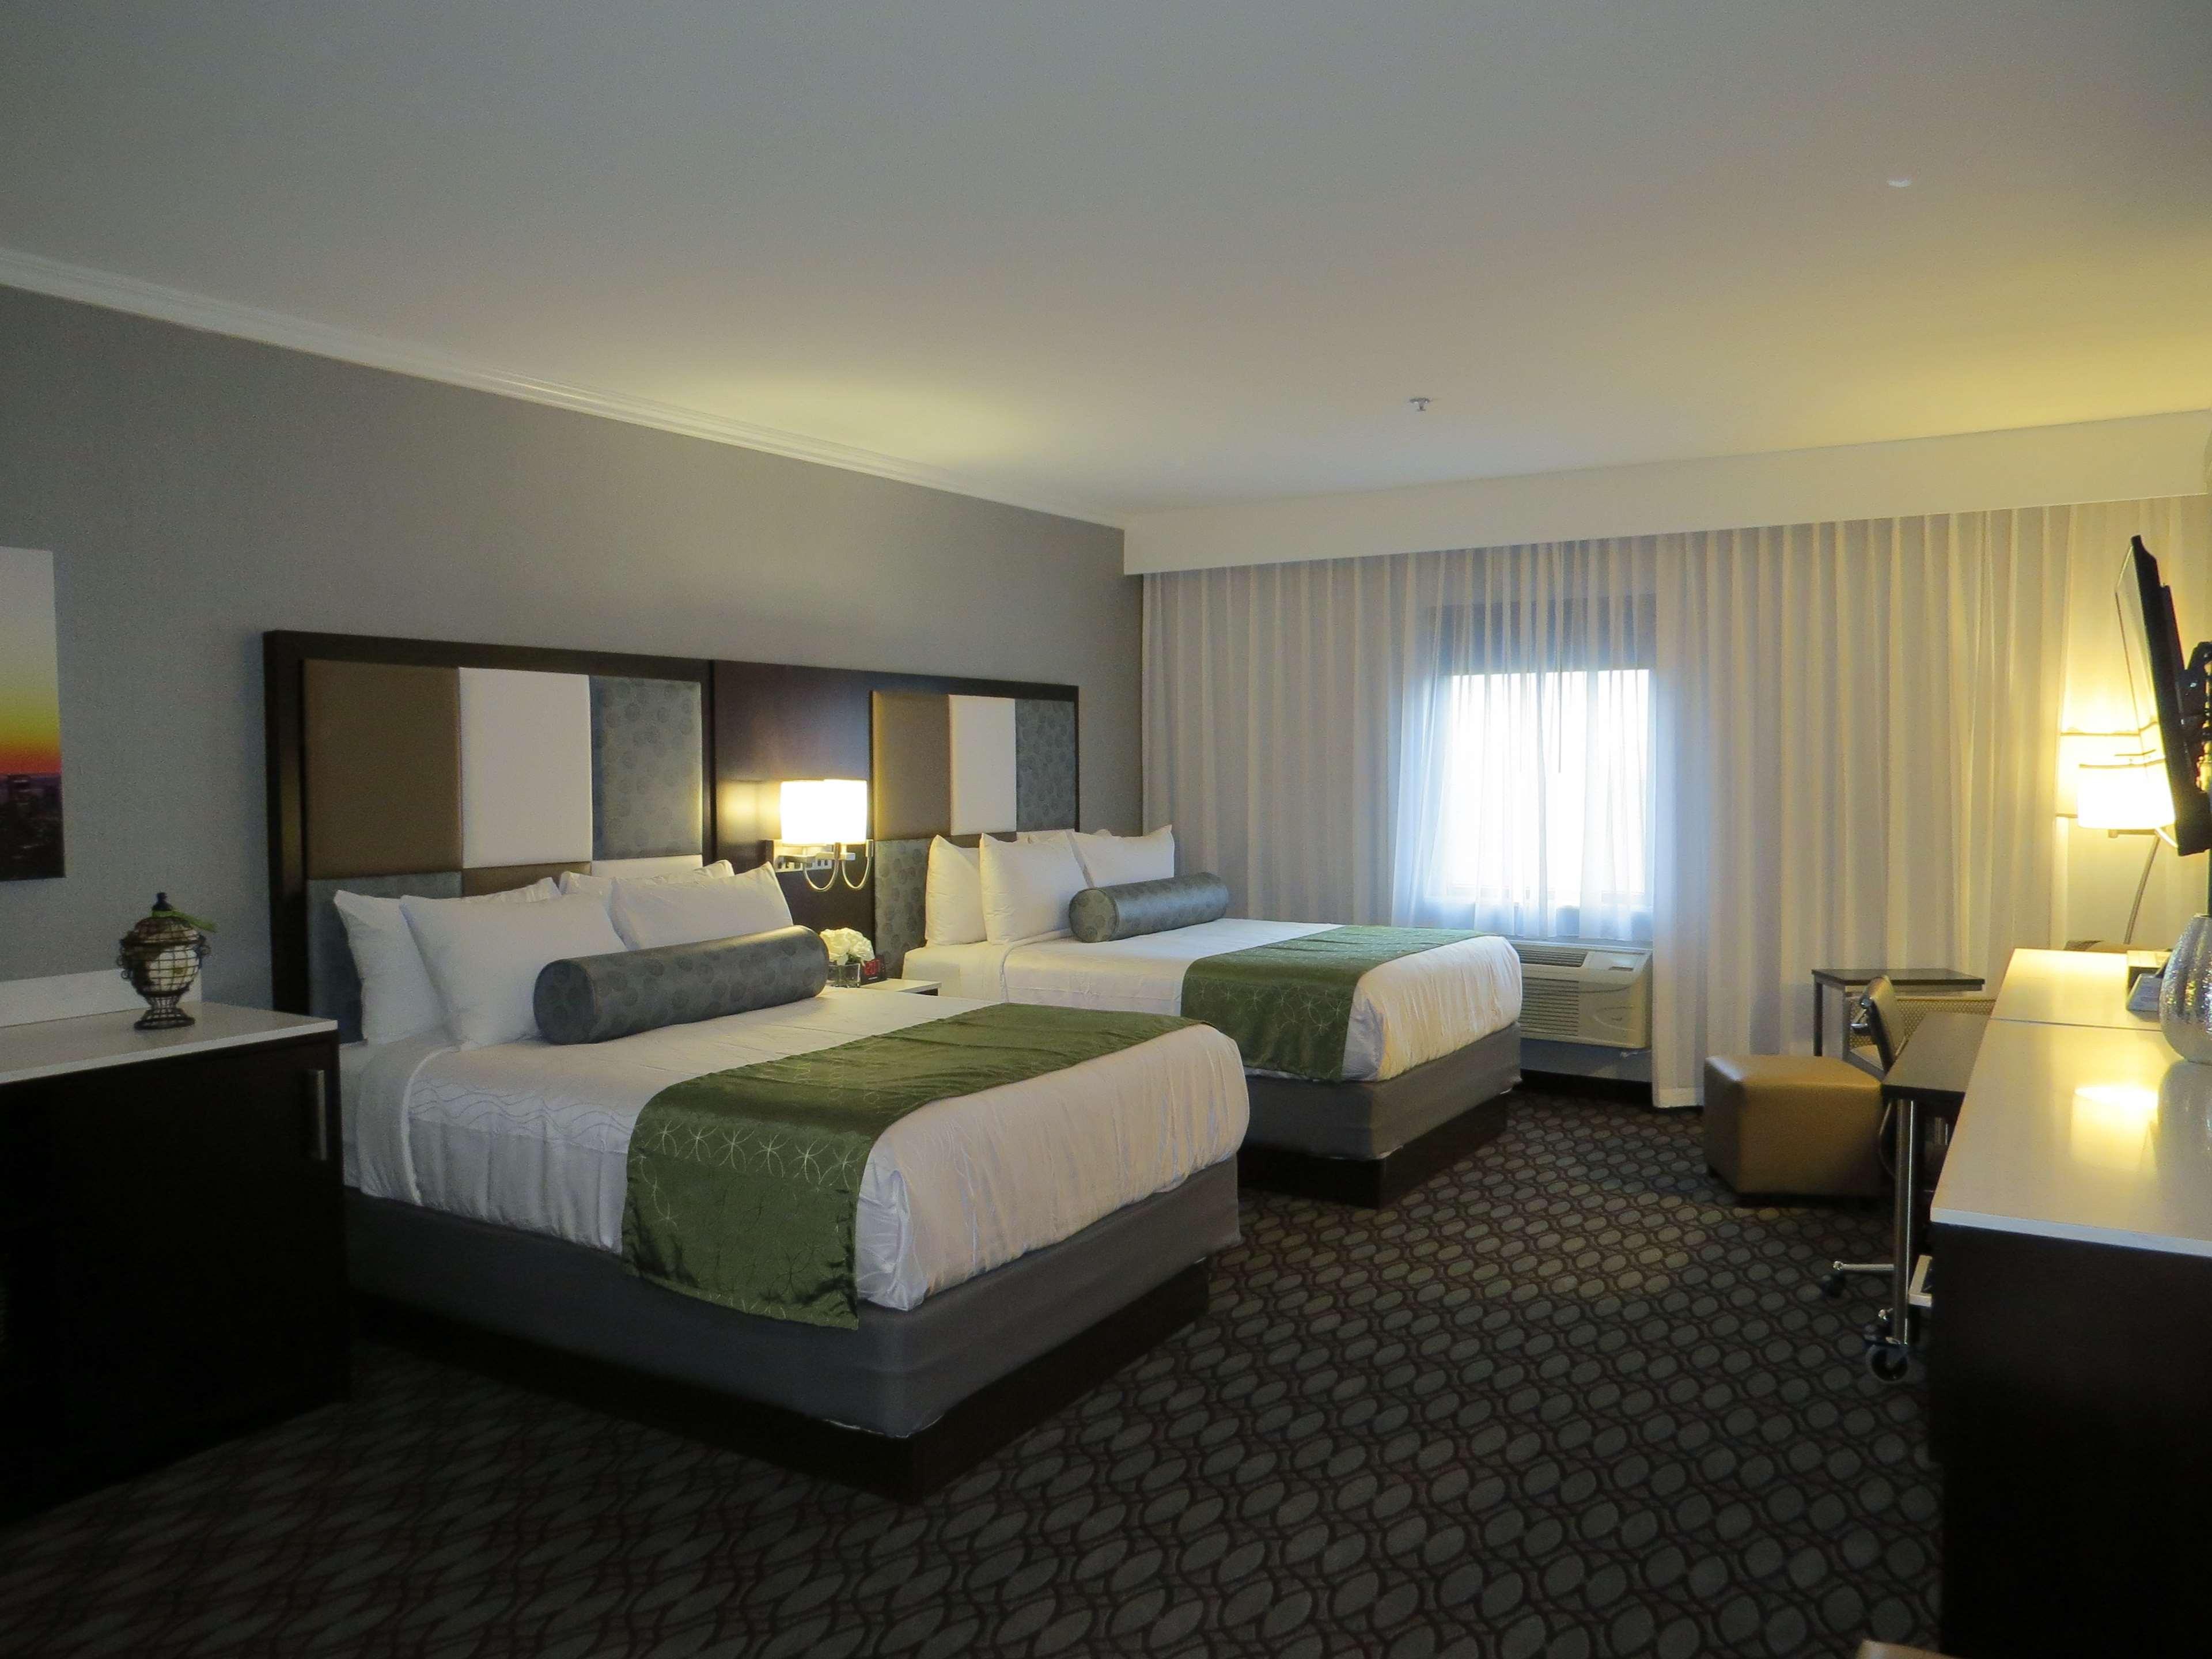 Best Western Premier NYC Gateway Hotel image 13